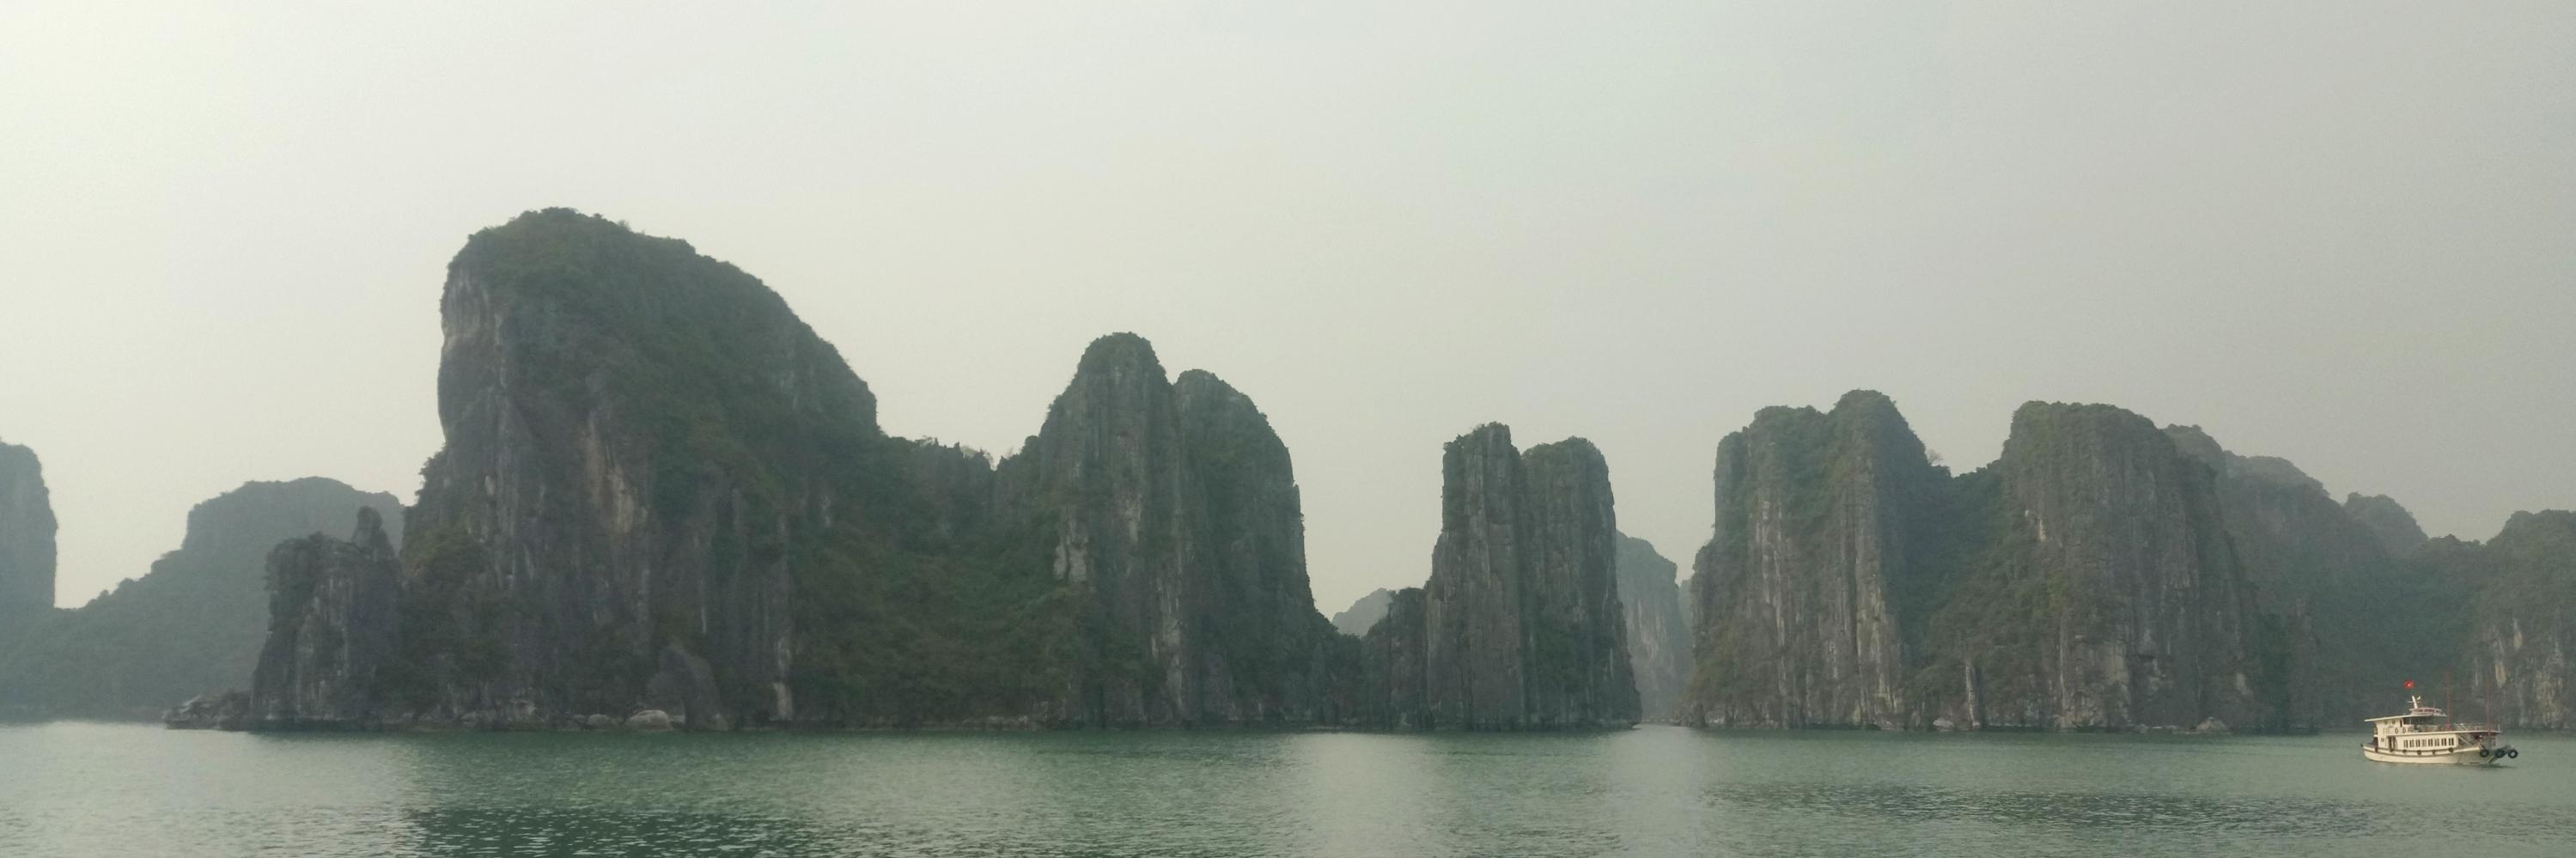 https://gody.vn/blog/trhgvhung.fa1924/post/vietnamsolo-vinh-ha-long-ky-quan-huyen-ao-923